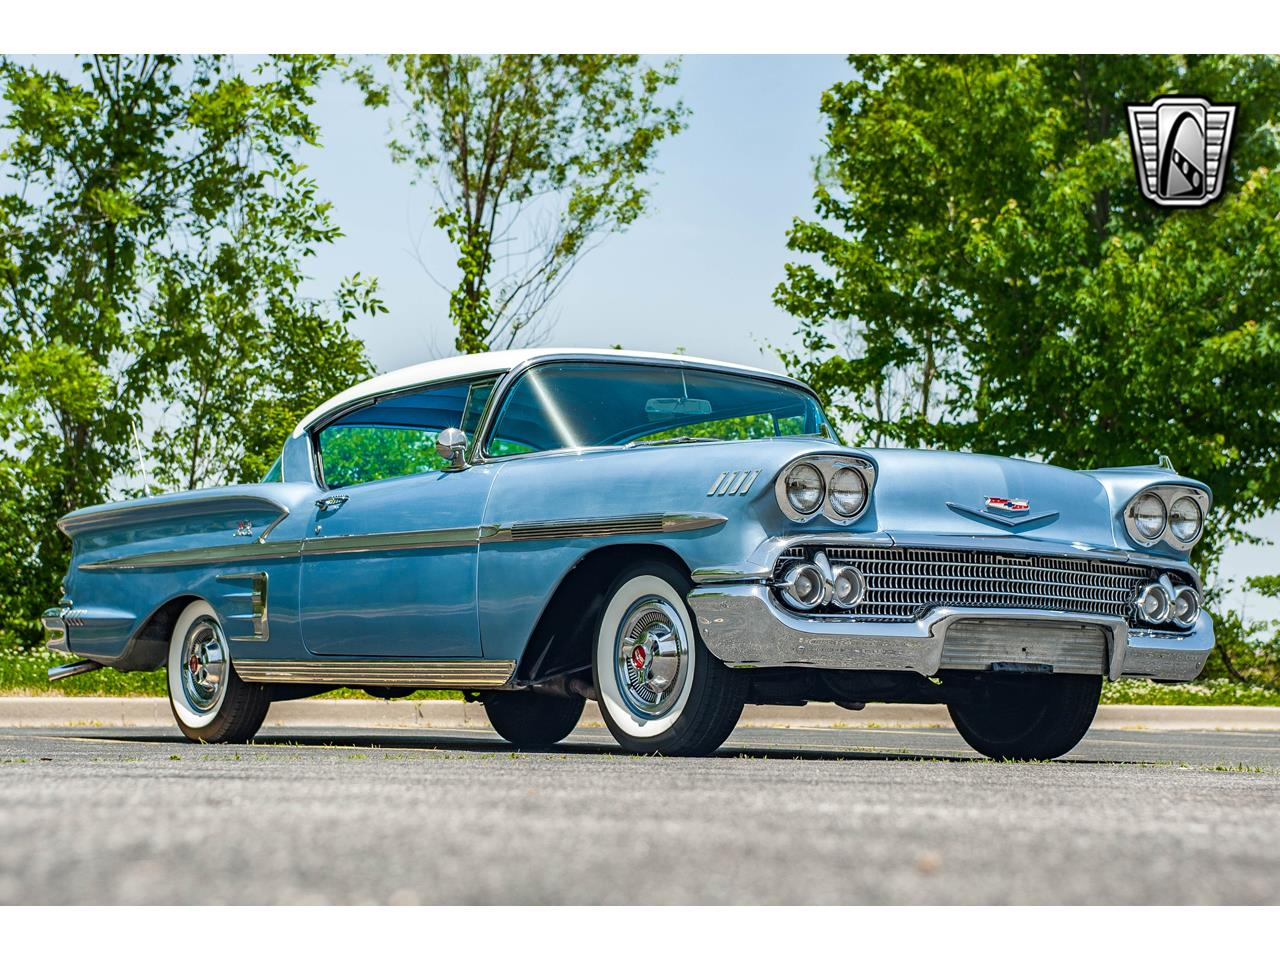 Large Picture of '58 Chevrolet Impala - $62,000.00 - QB9Q